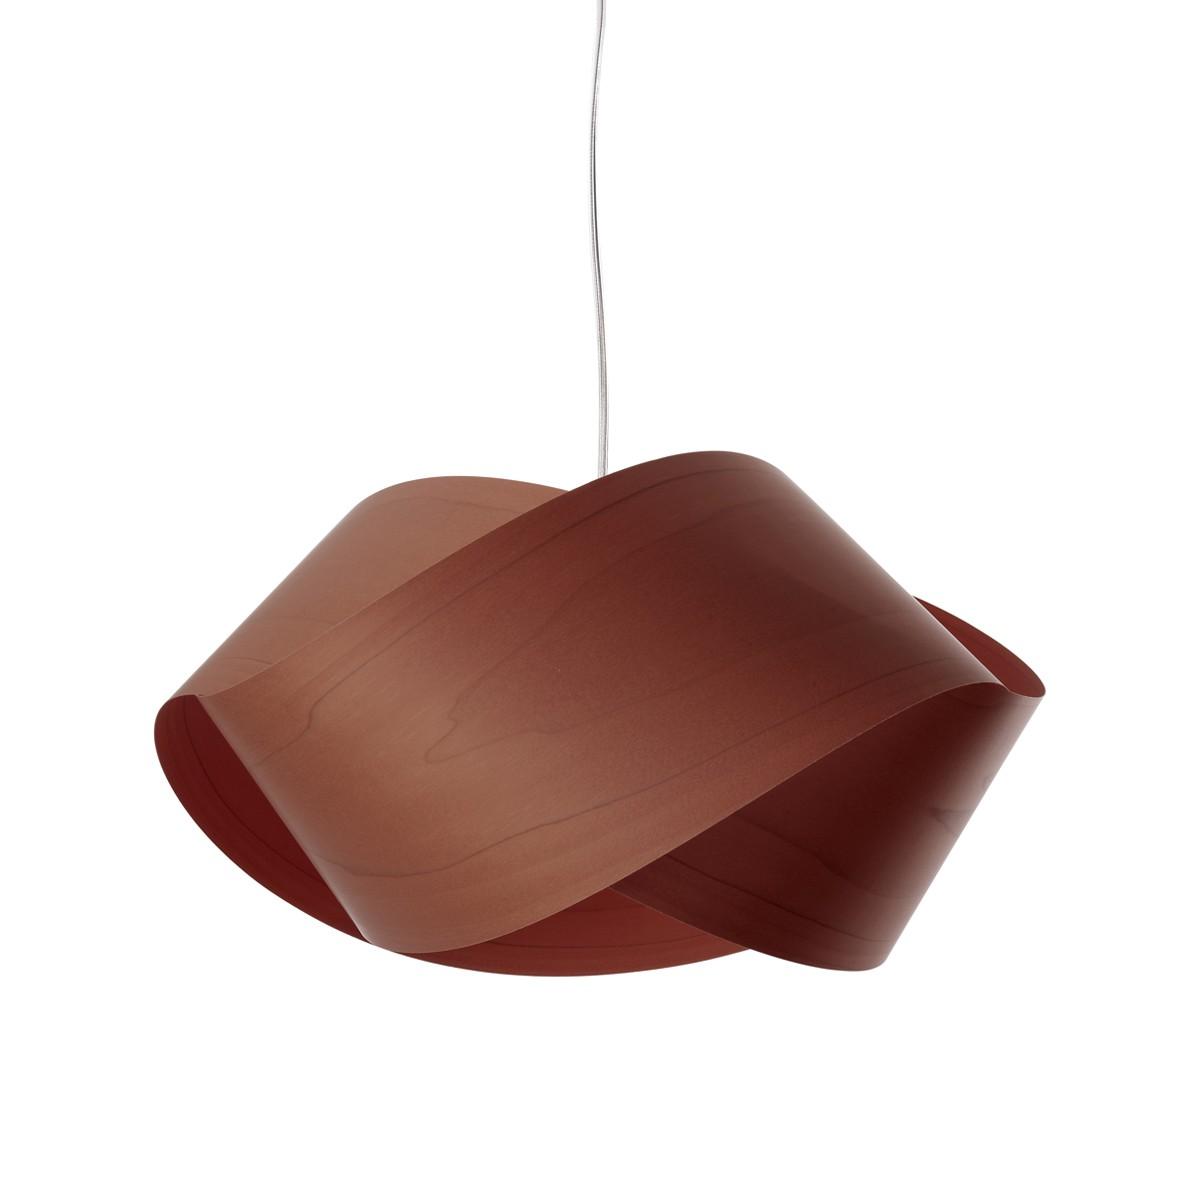 LZF Lamps Nut Pendelleuchte, schokolade